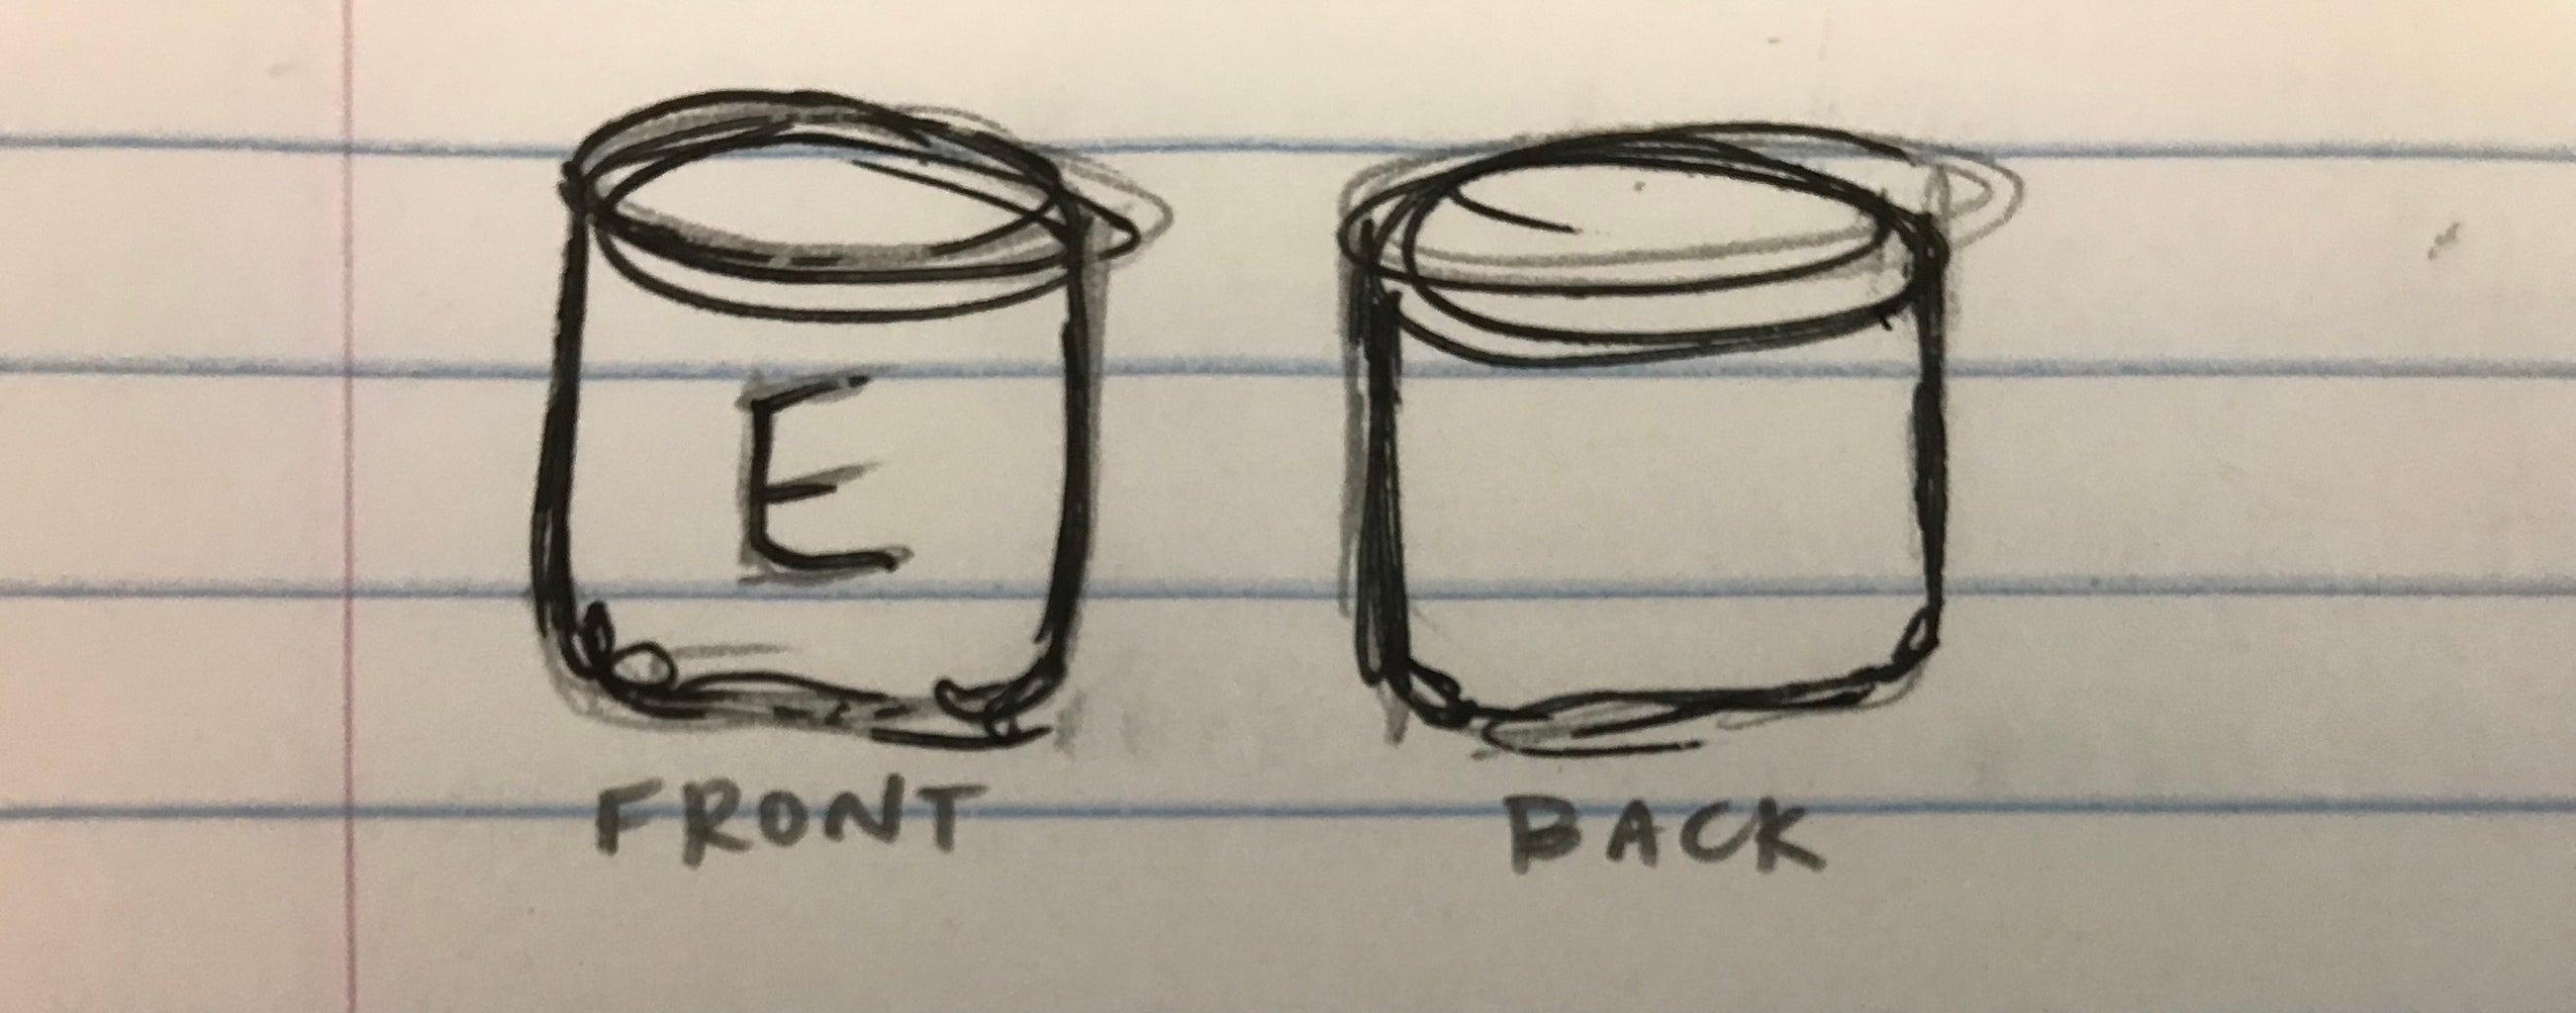 Step Three: Sketch Your Design